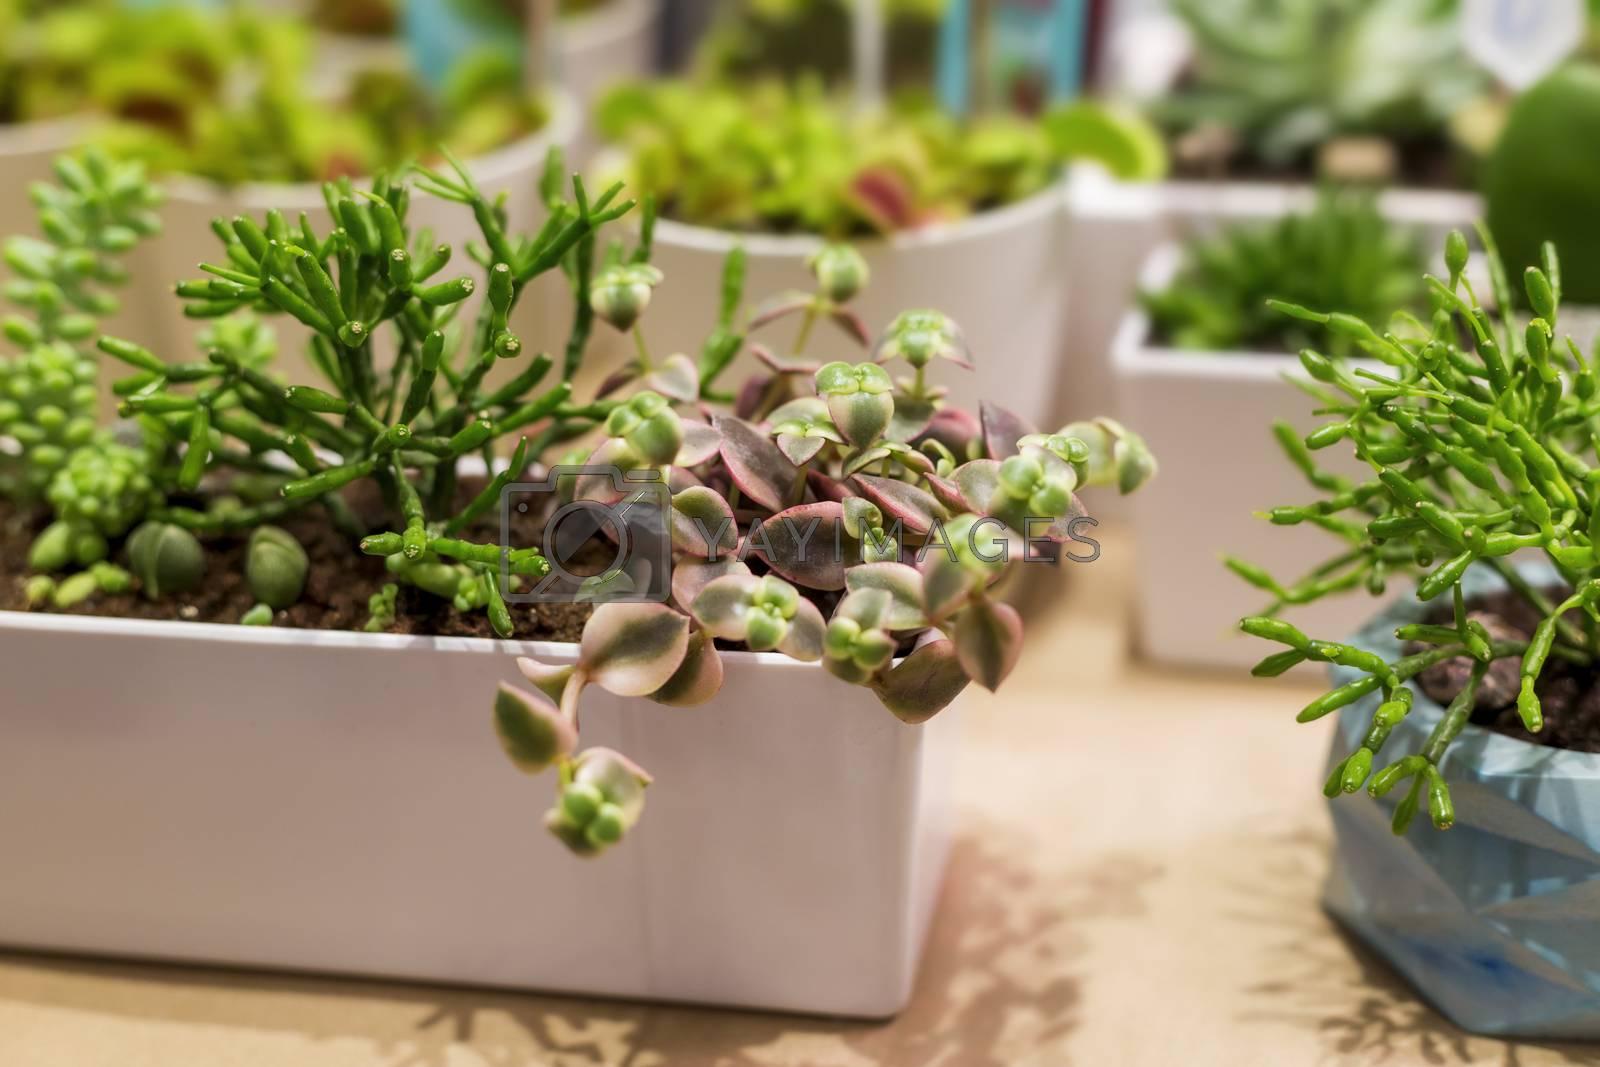 .Succulent gardens in a white decorative pot for interior decoration